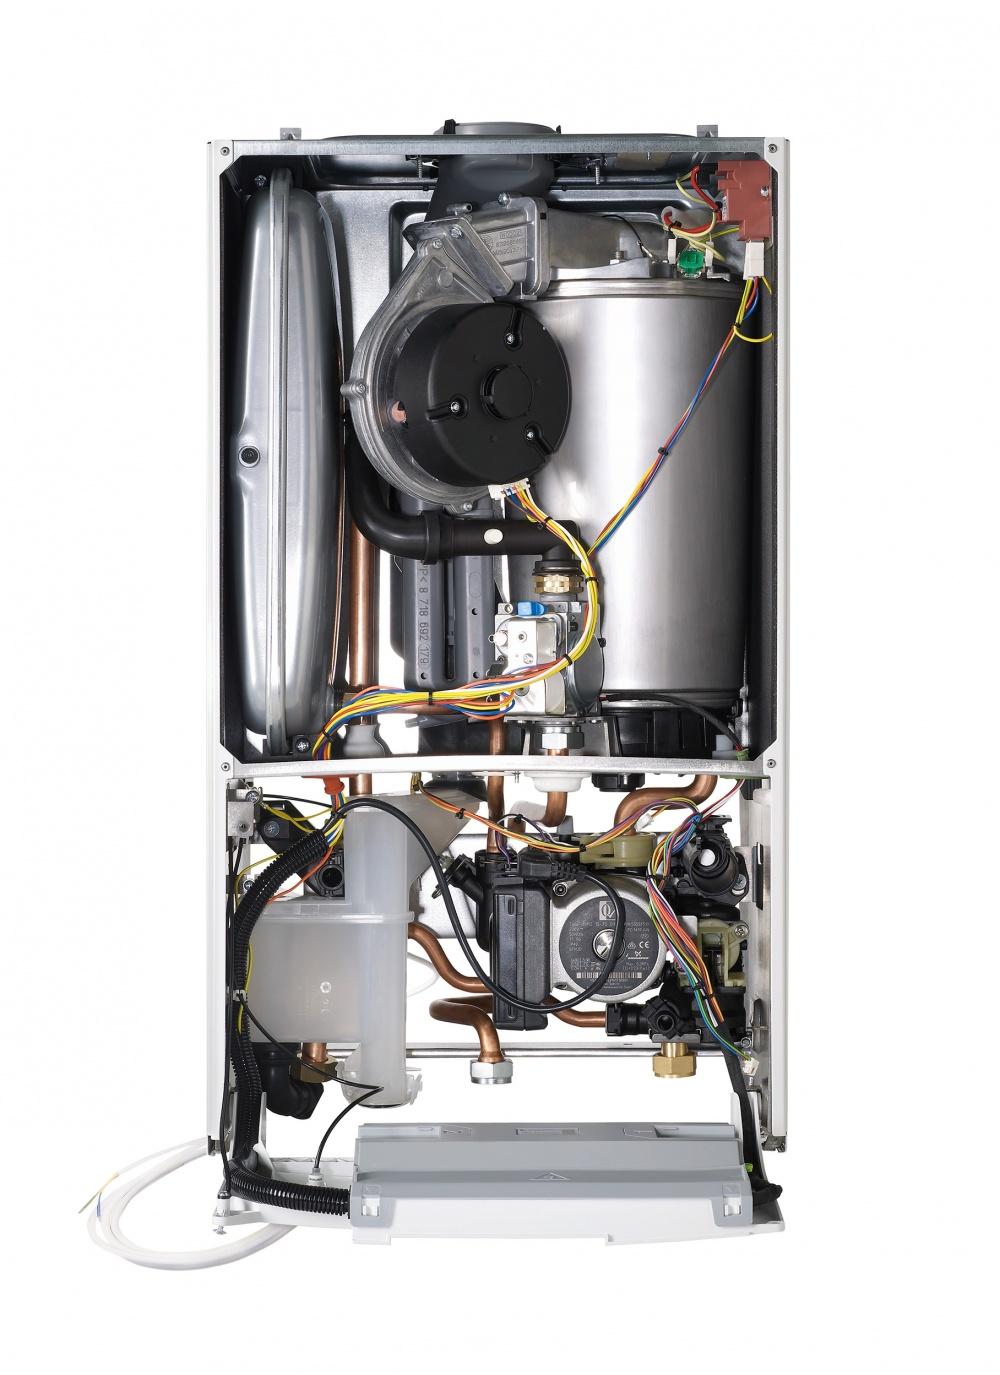 Worcester Bosch 24i System Boiler Wiring Diagram - Somurich.com